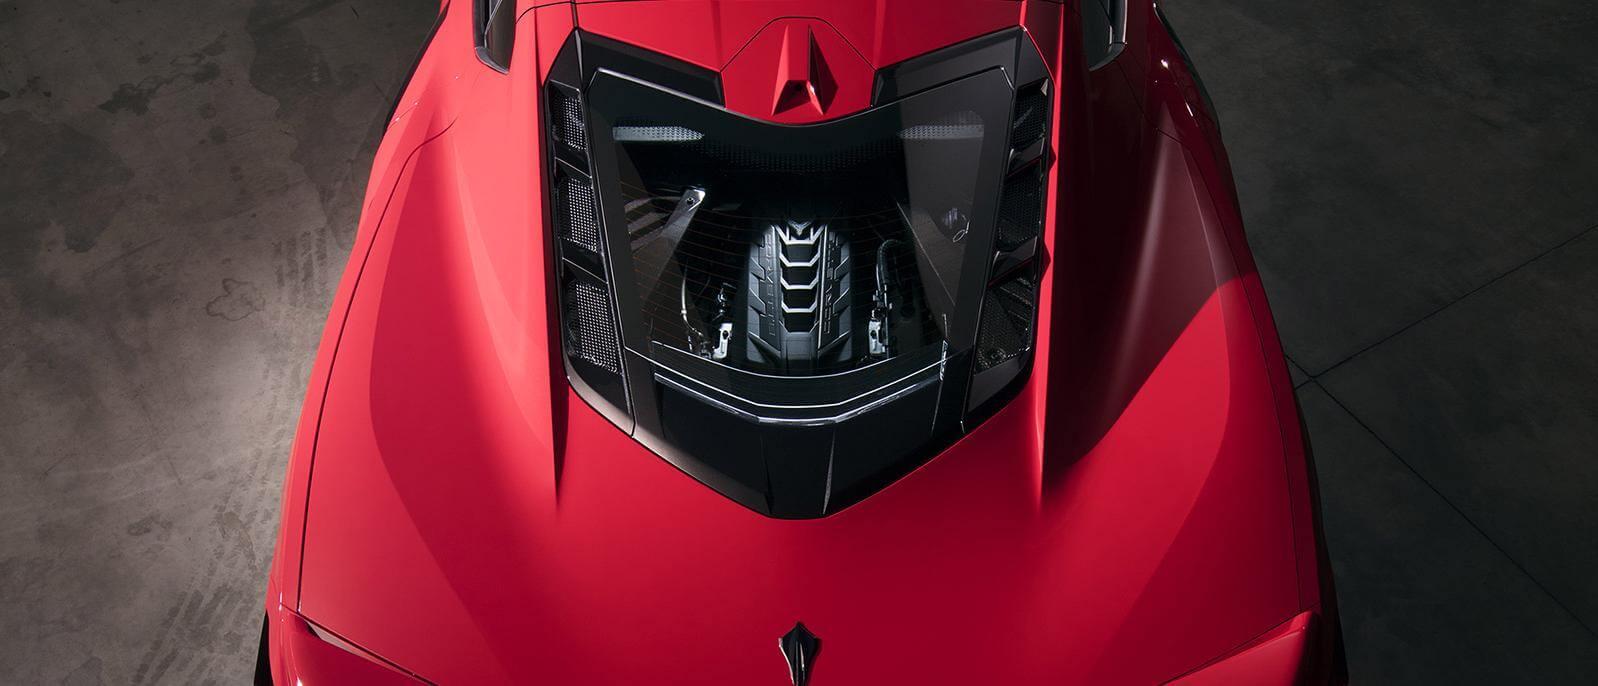 2020 Corvette at Anderson Chevrolet